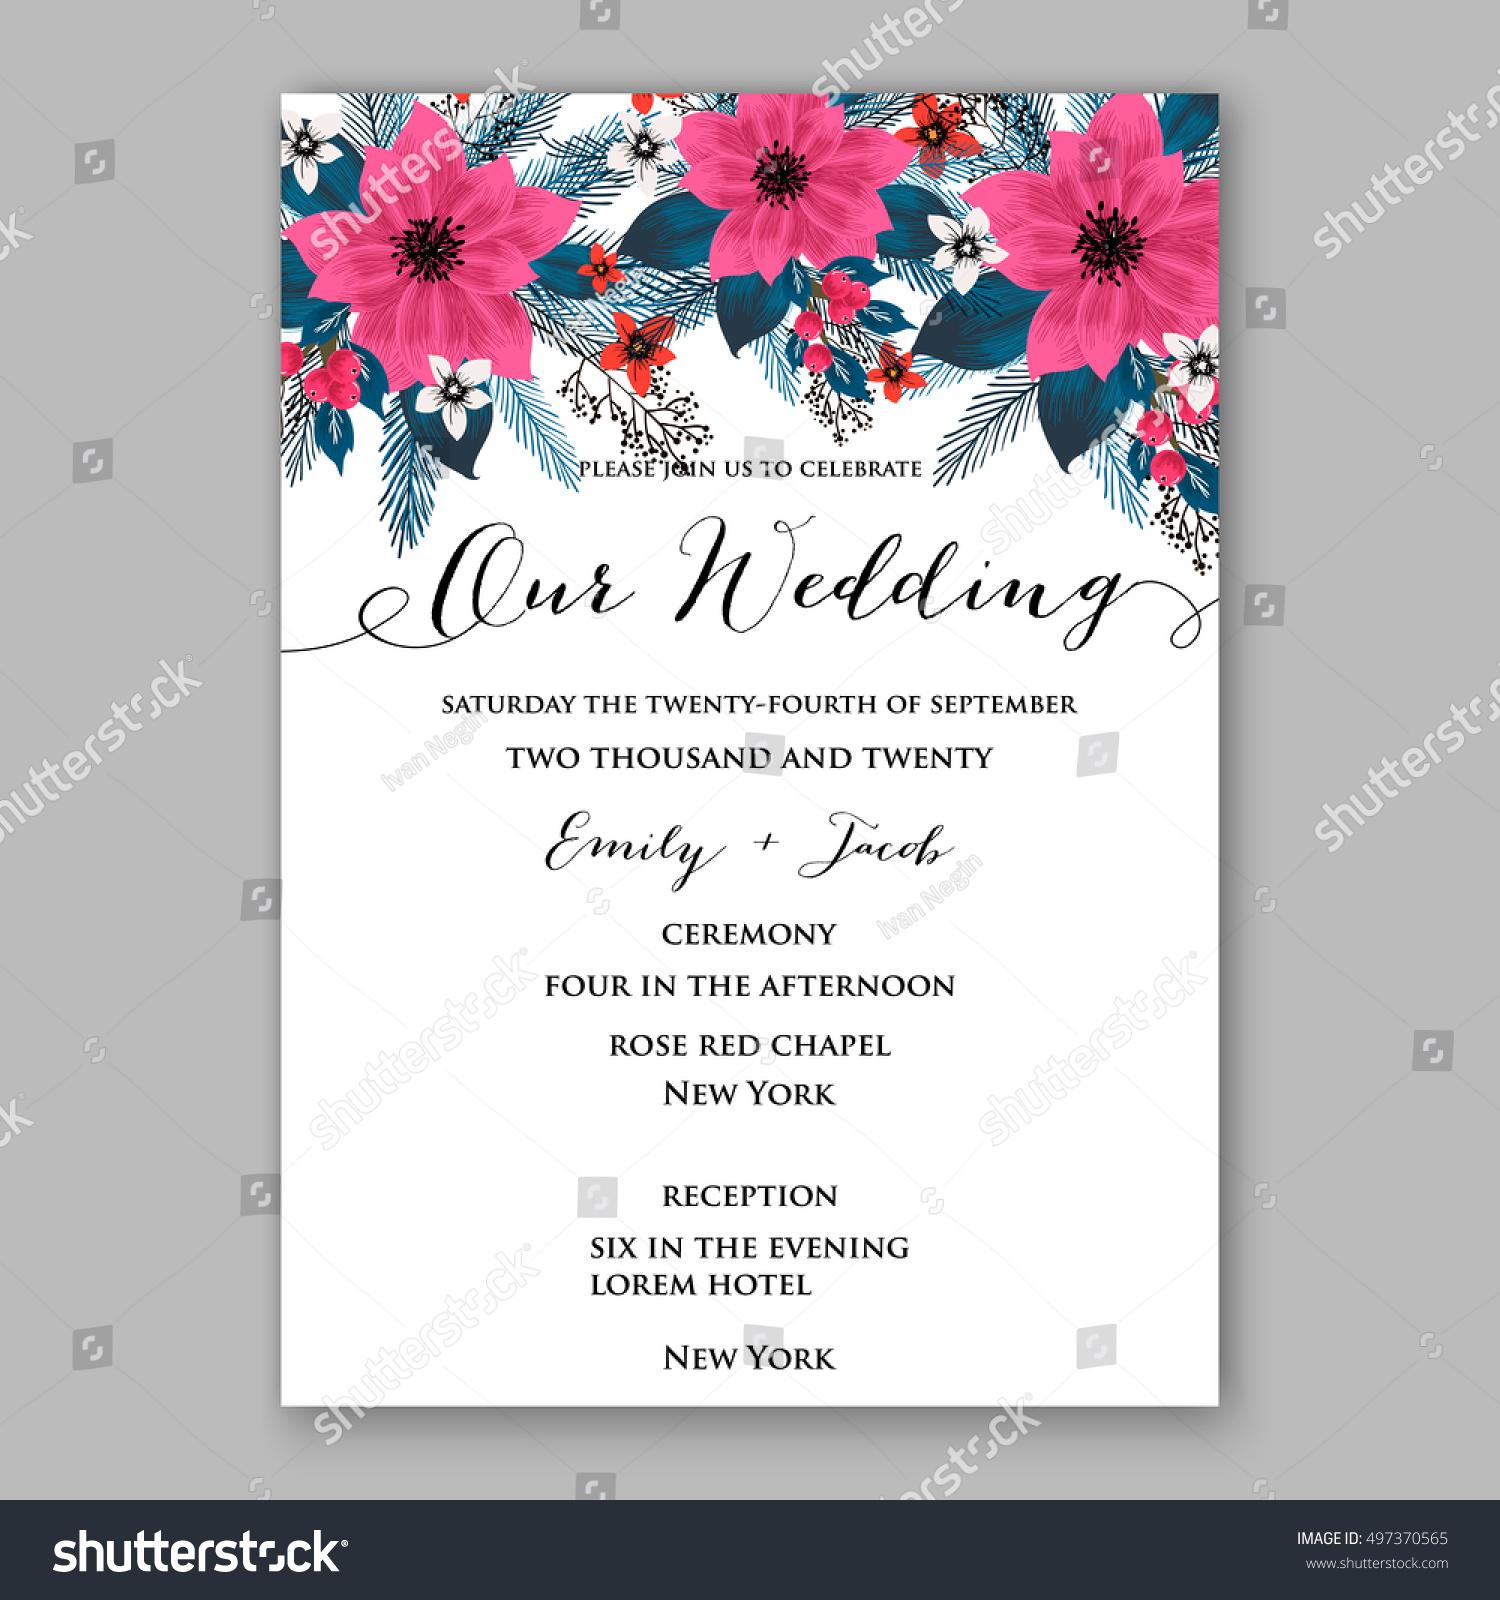 Poinsettia Wedding Invitation Sample Card Beautiful Stock Vector